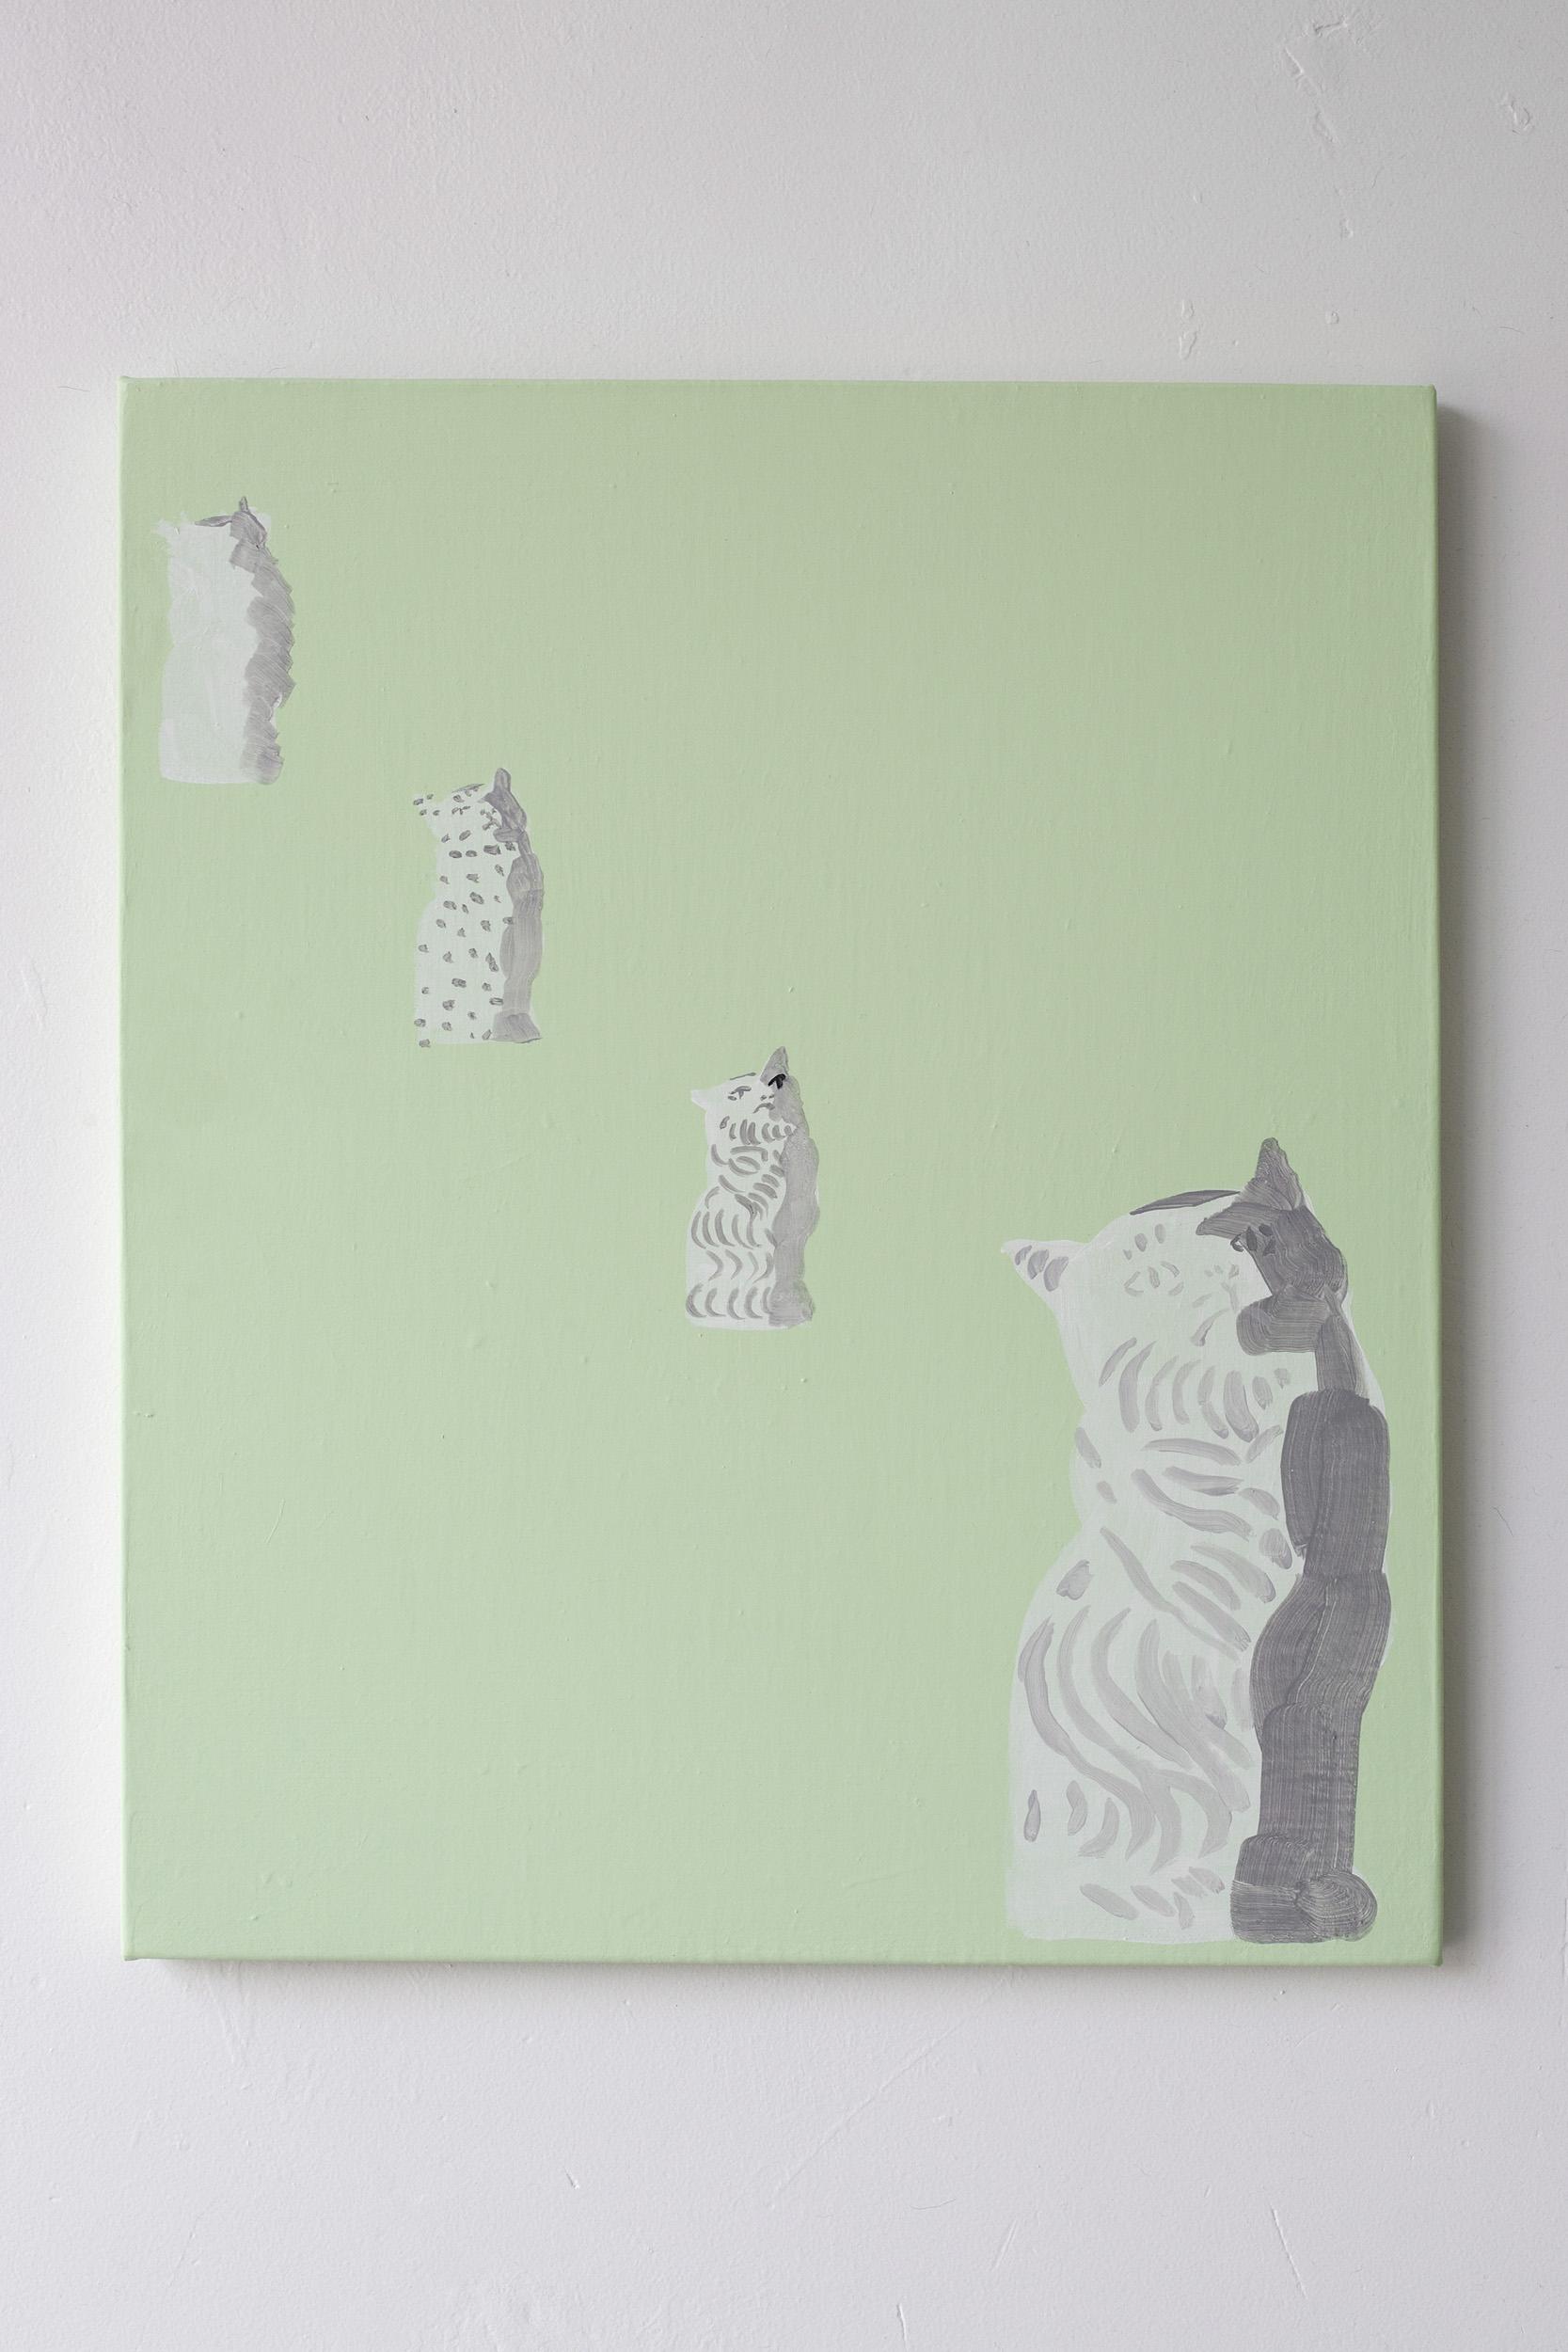 Shimon Minamikawa  (Various) Cat (Figurines),  2019. Acrylic on canvas,45.6 x 38 cm